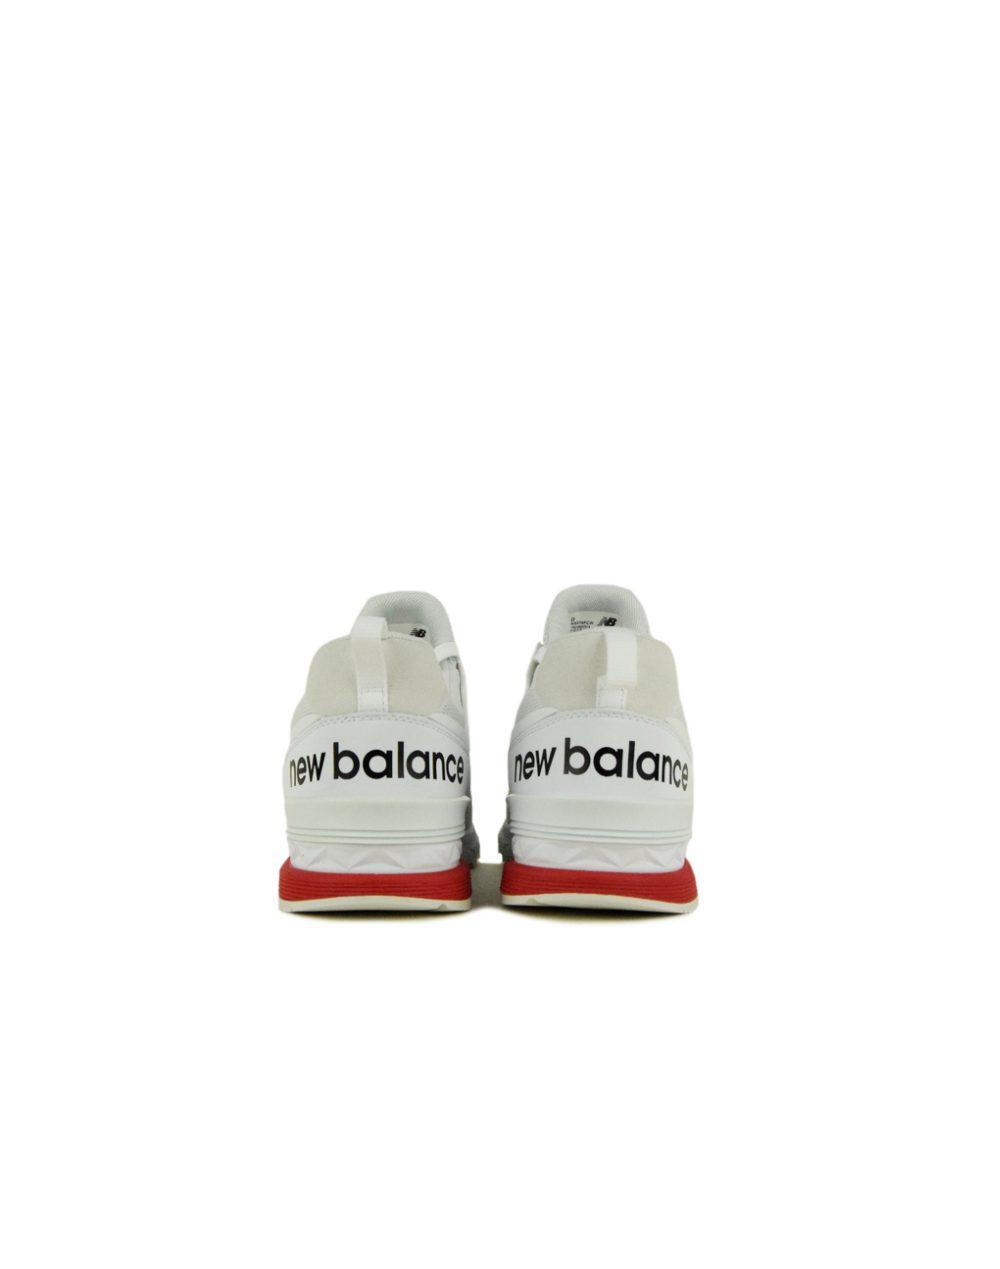 New Balance MS574PCW White